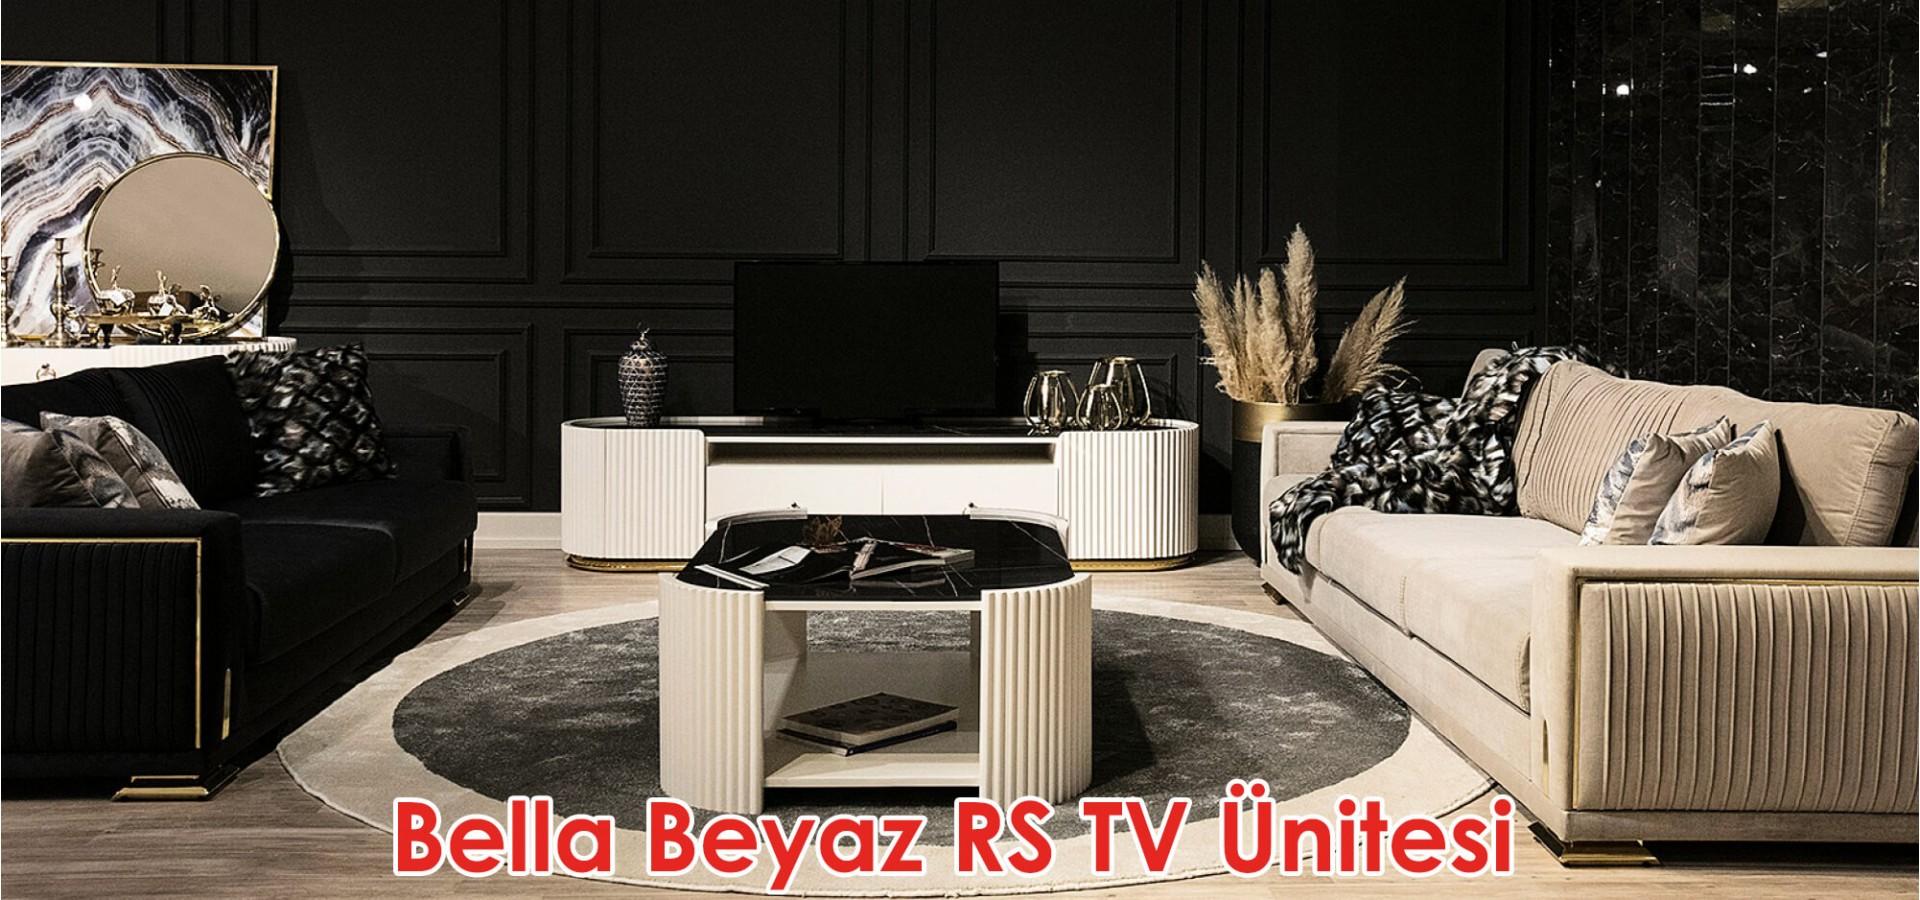 Bella Beyaz RS TV Ünitesi